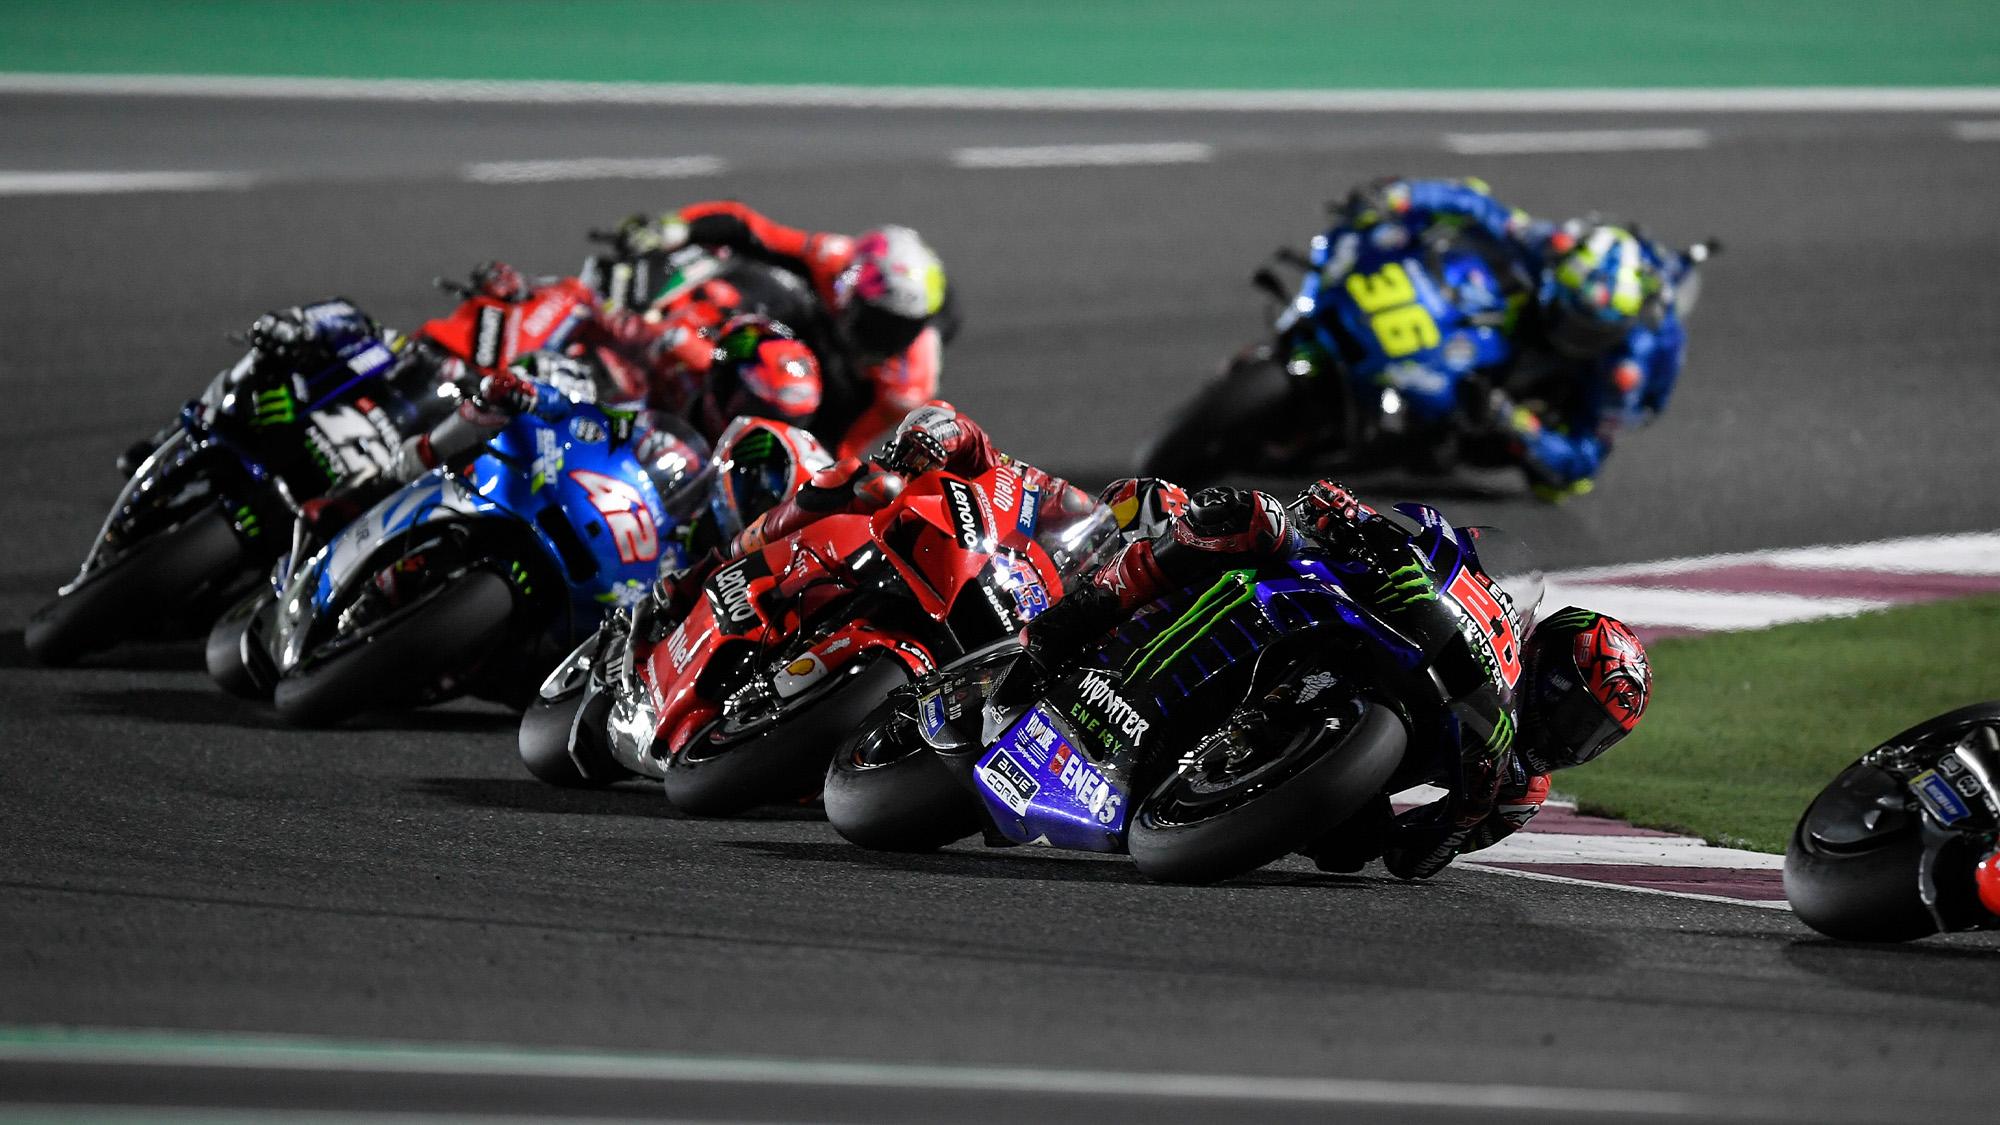 Fabio Quartararo charging through the field during the 2021 MotoGP Doha race